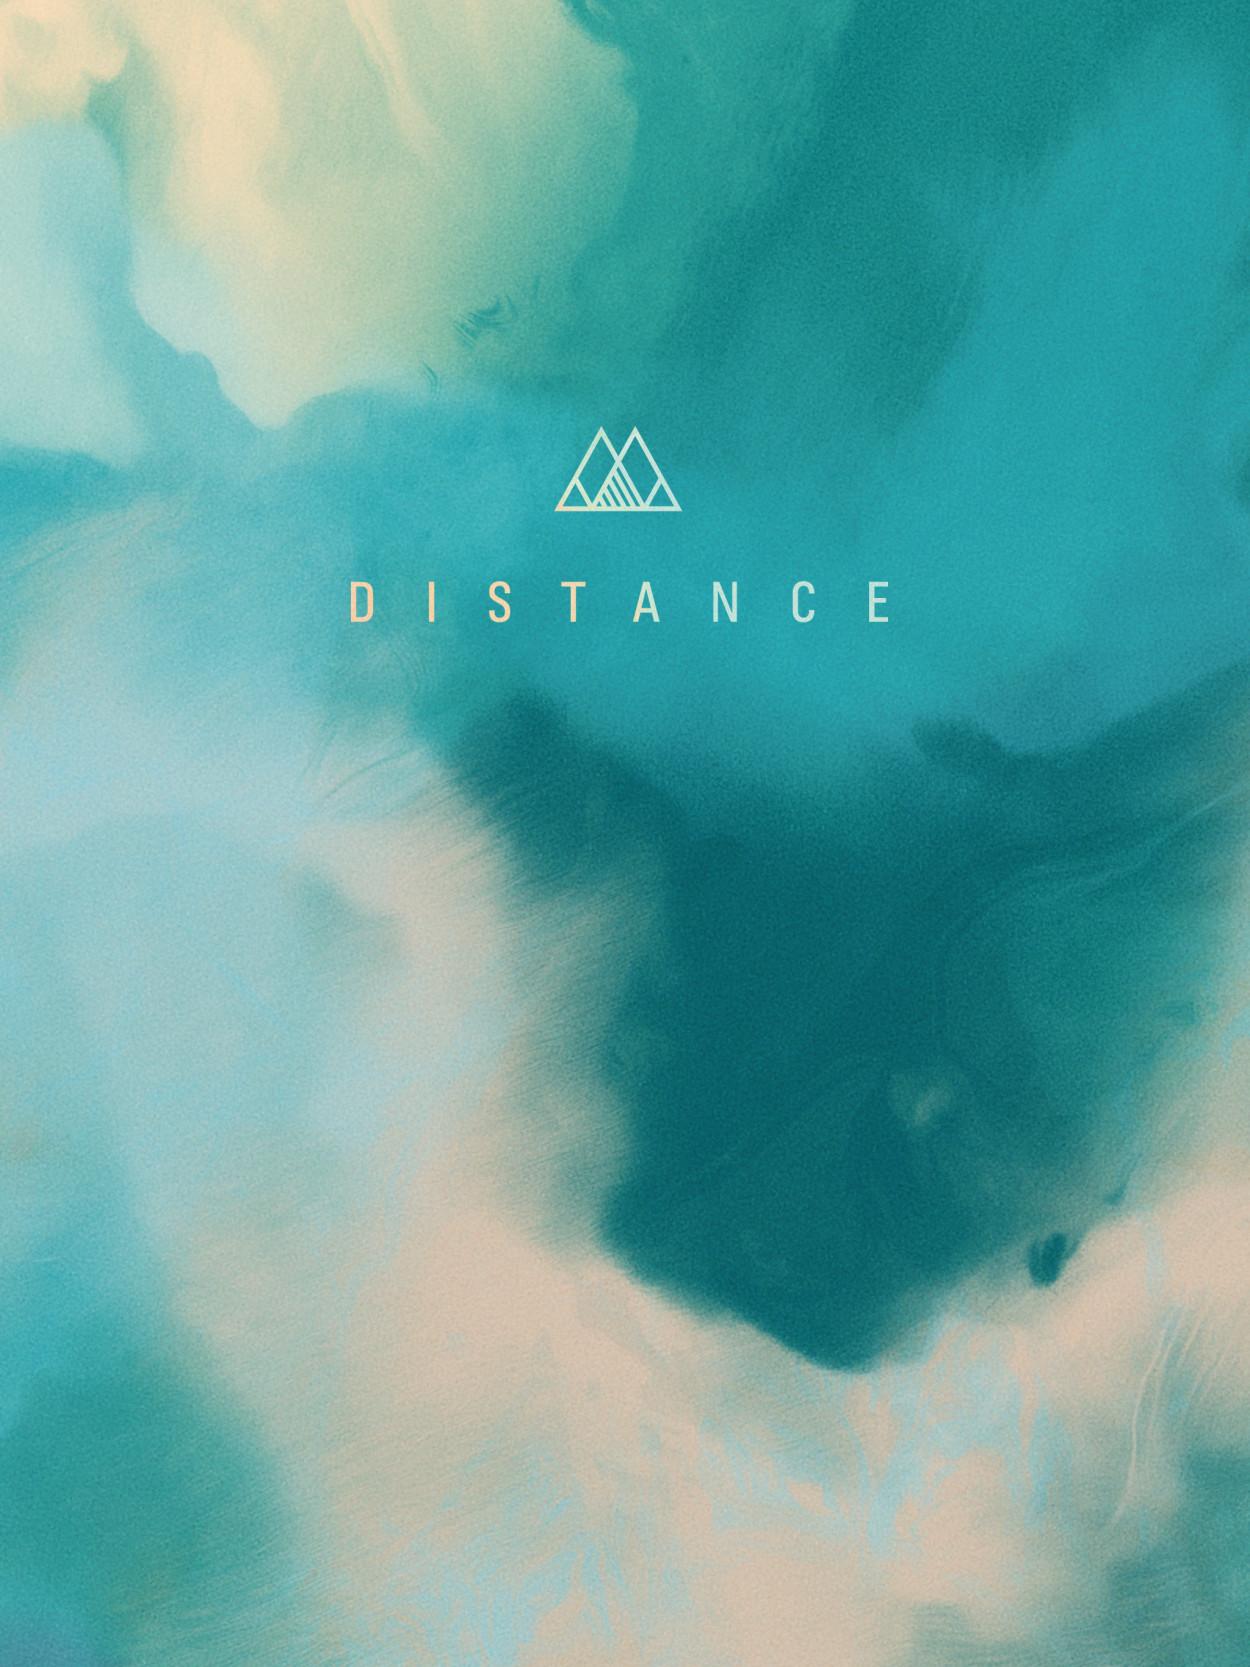 DISTANCE-WALLPAPER-001-IPAD.jpg